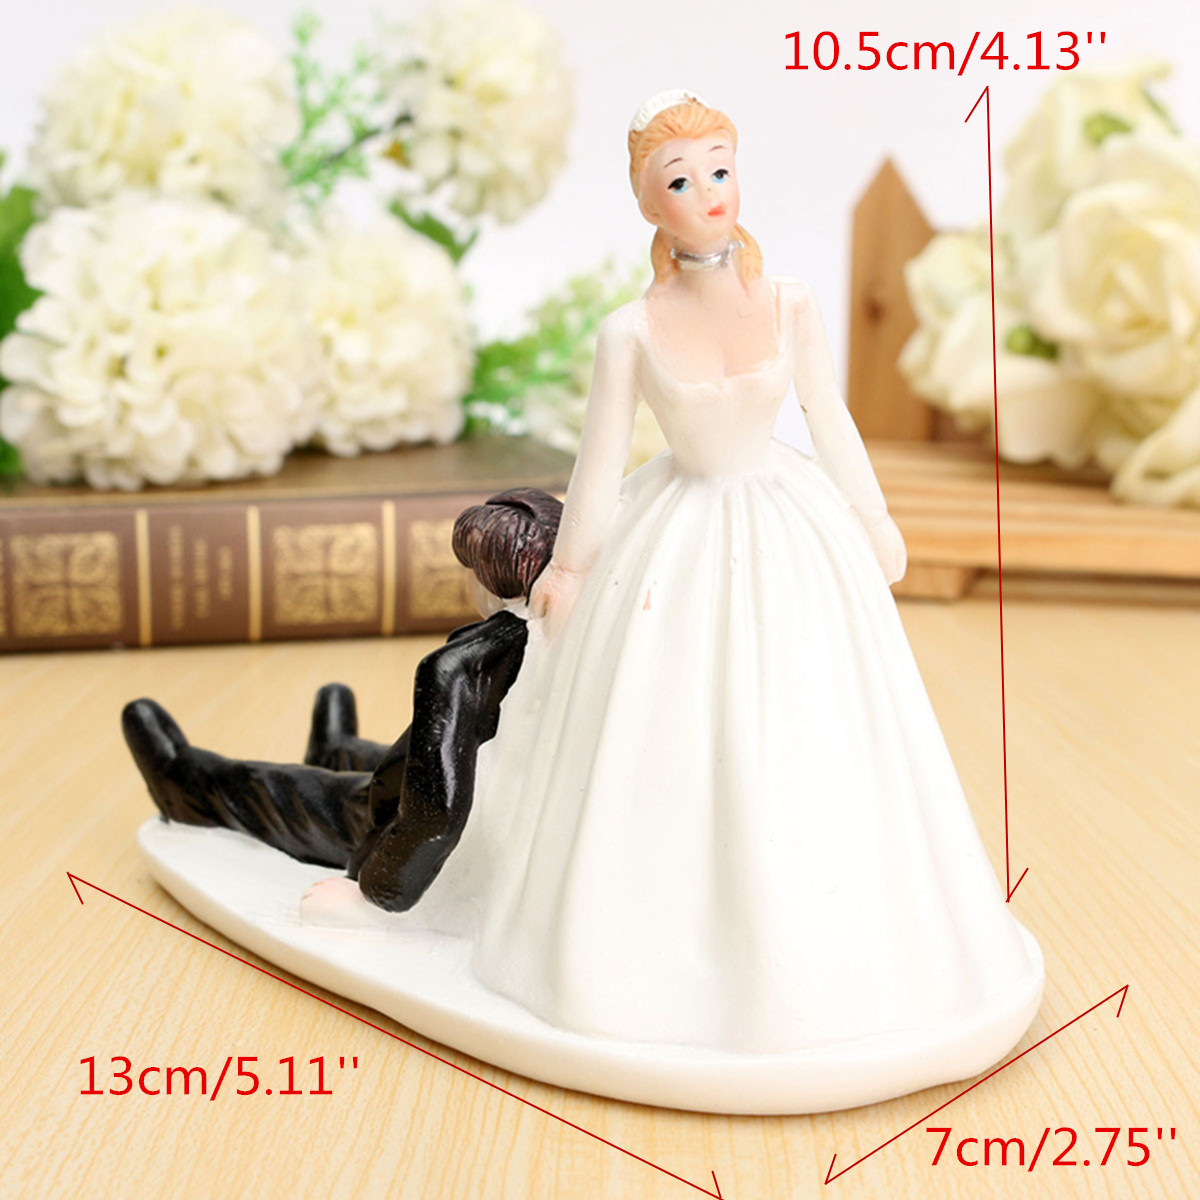 ROMANTIC FUNNY WEDDING CAKE TOPPER FIGURE BRIDE GROOM COUPLE BRIDAL ...